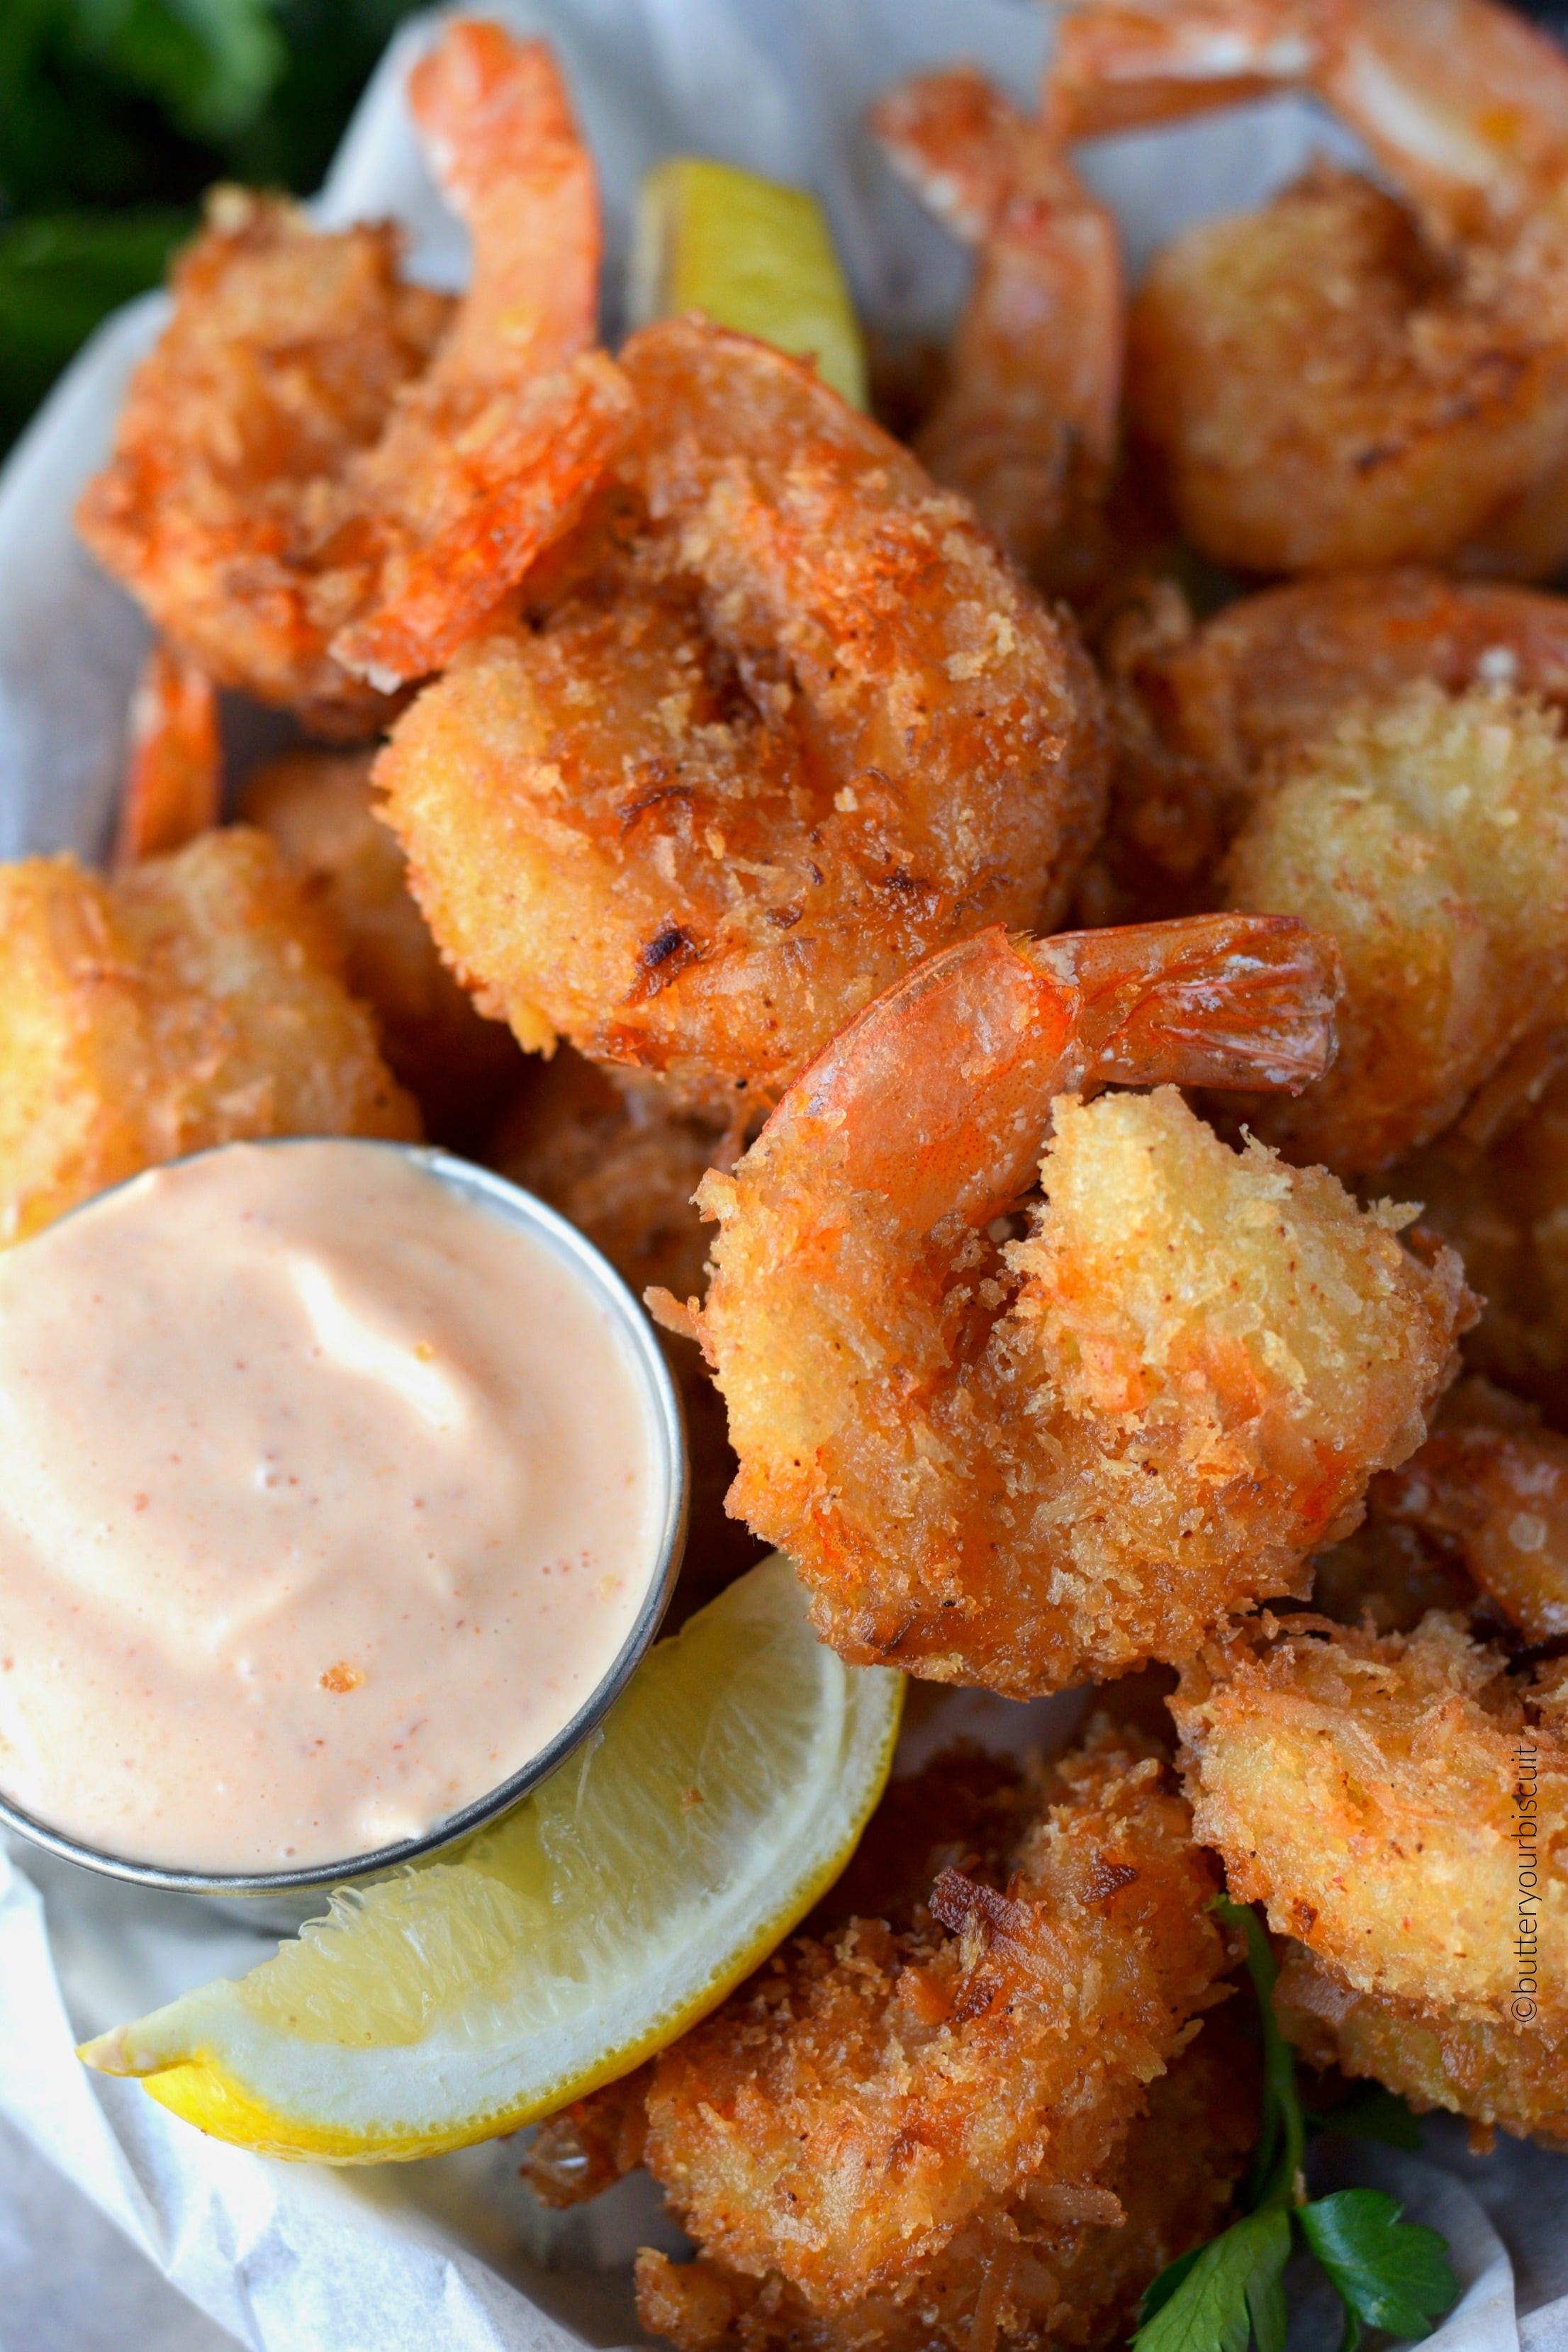 Coconut Shrimp Recipes  Crispy Fried Coconut Shrimp Recipe Butter Your Biscuit